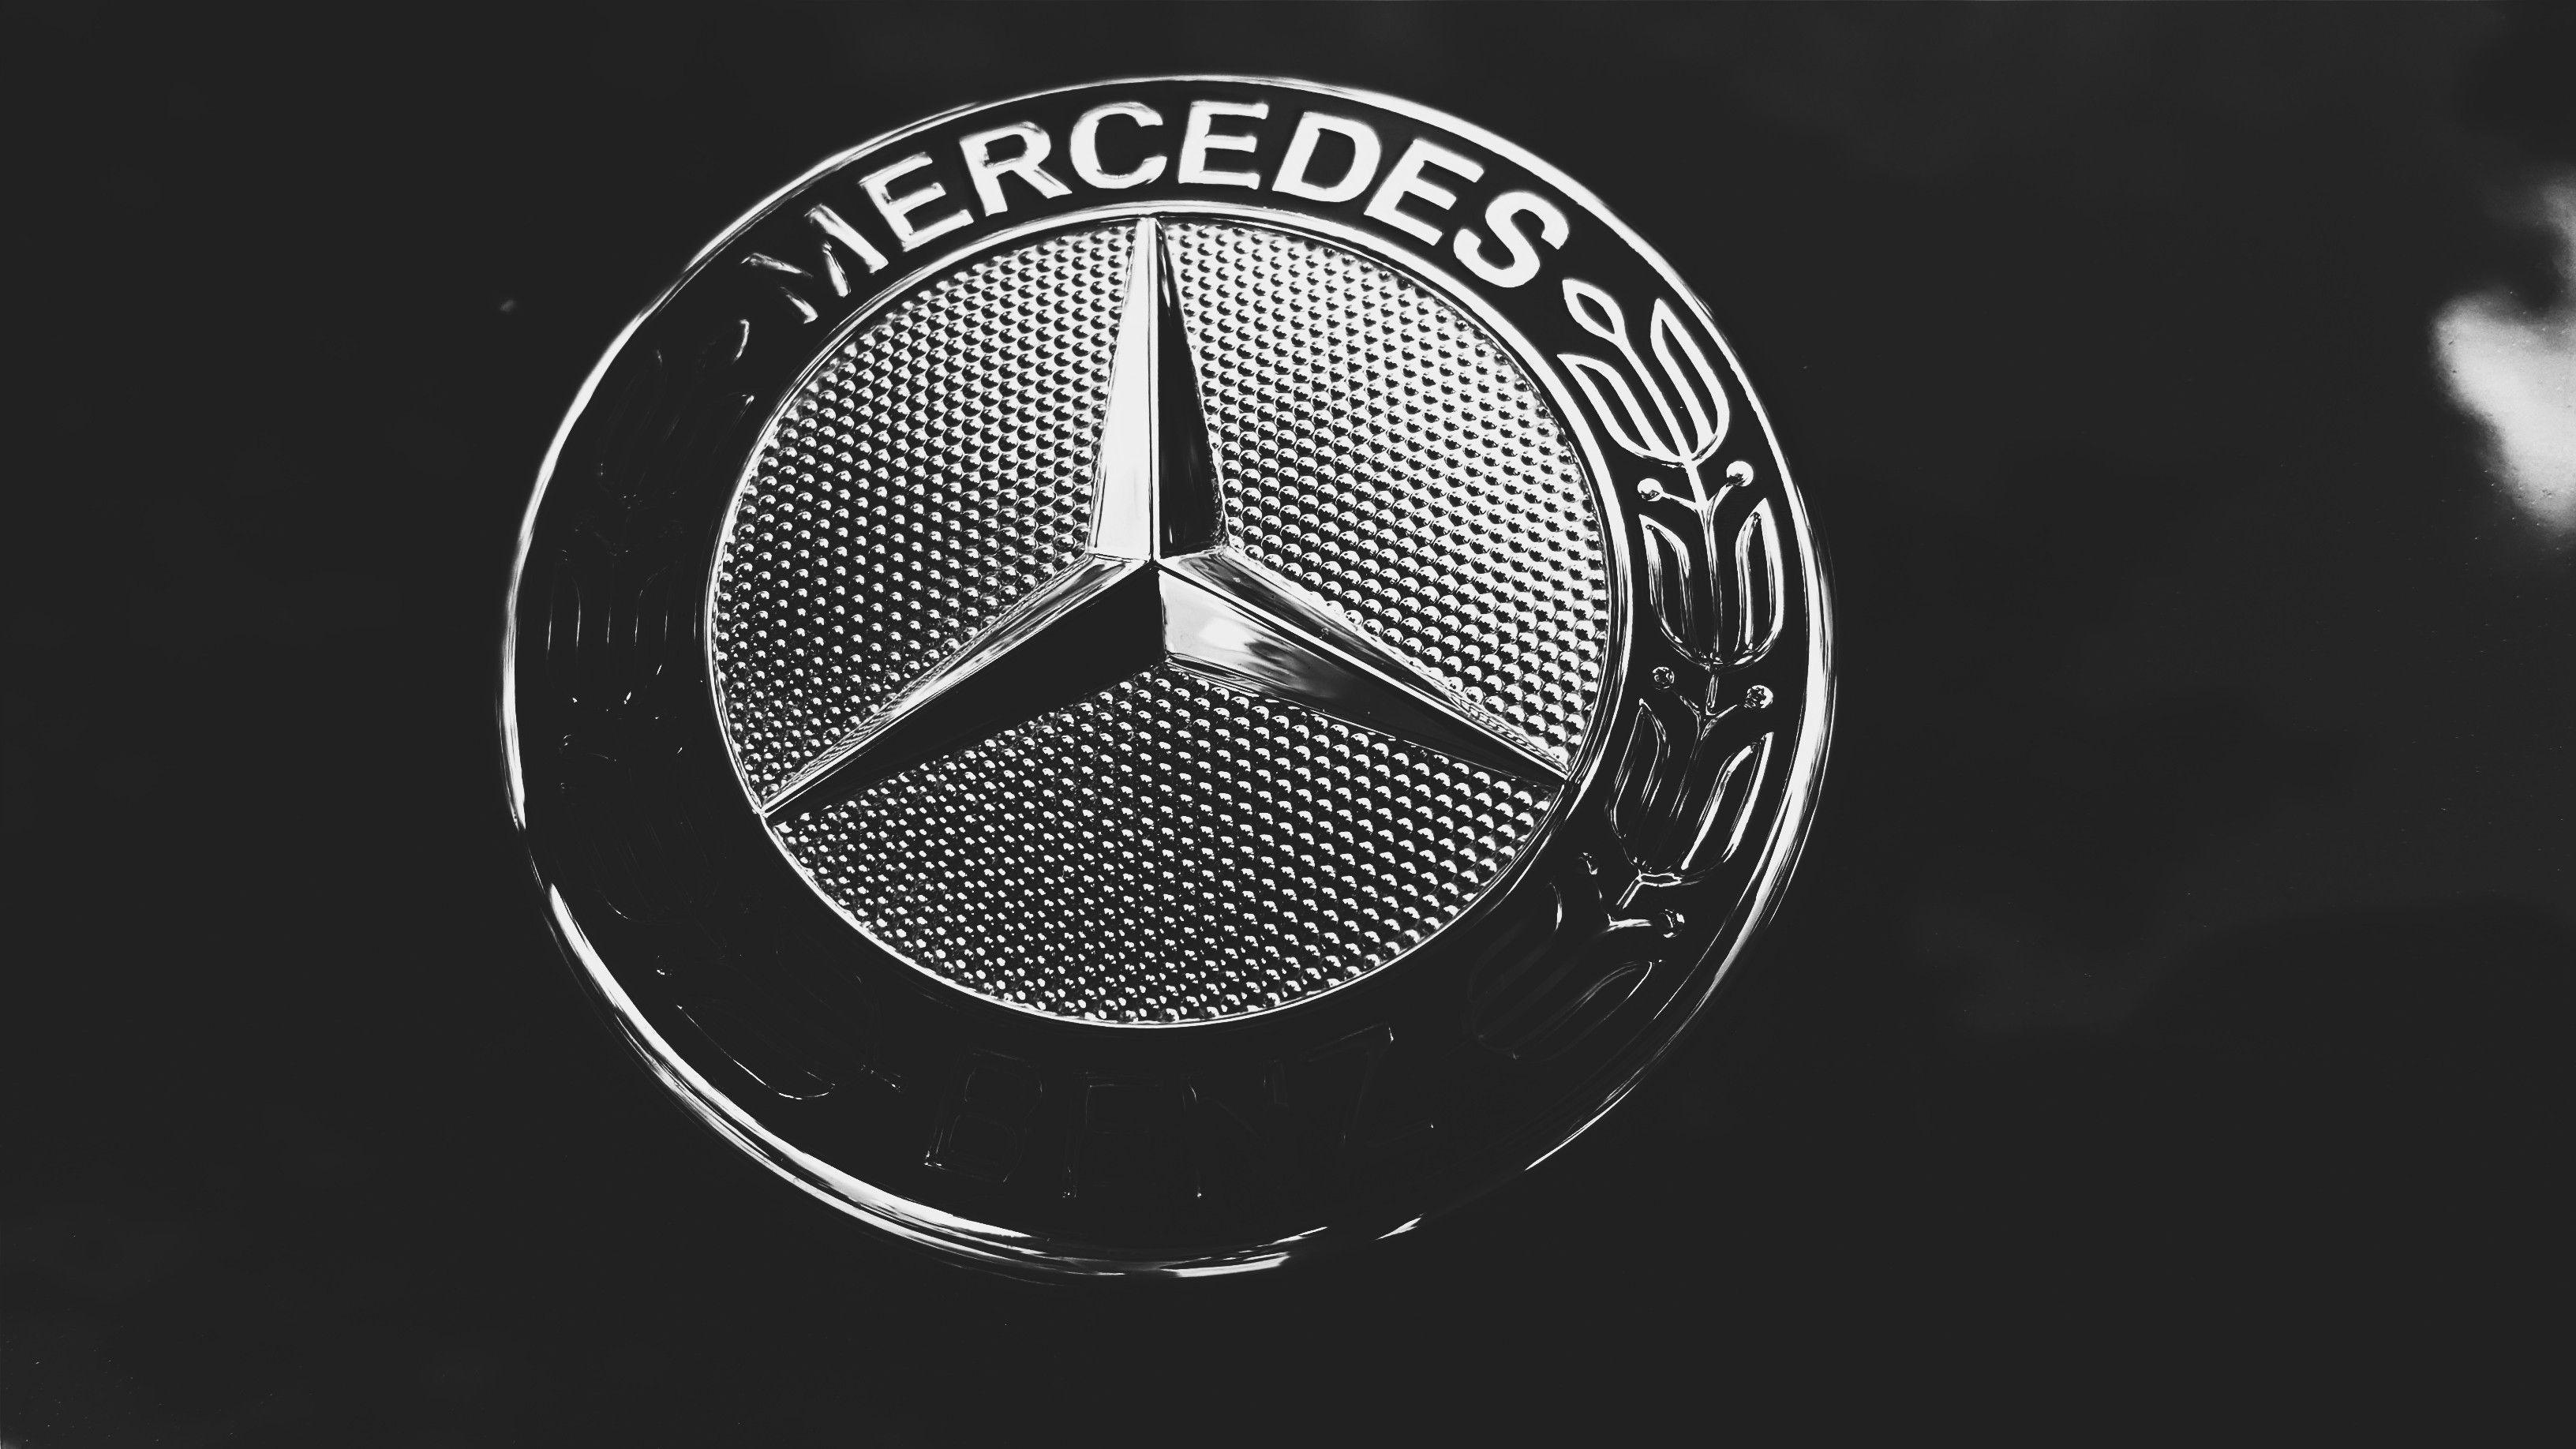 Mercedes Logo Wallpapers 3264x1836